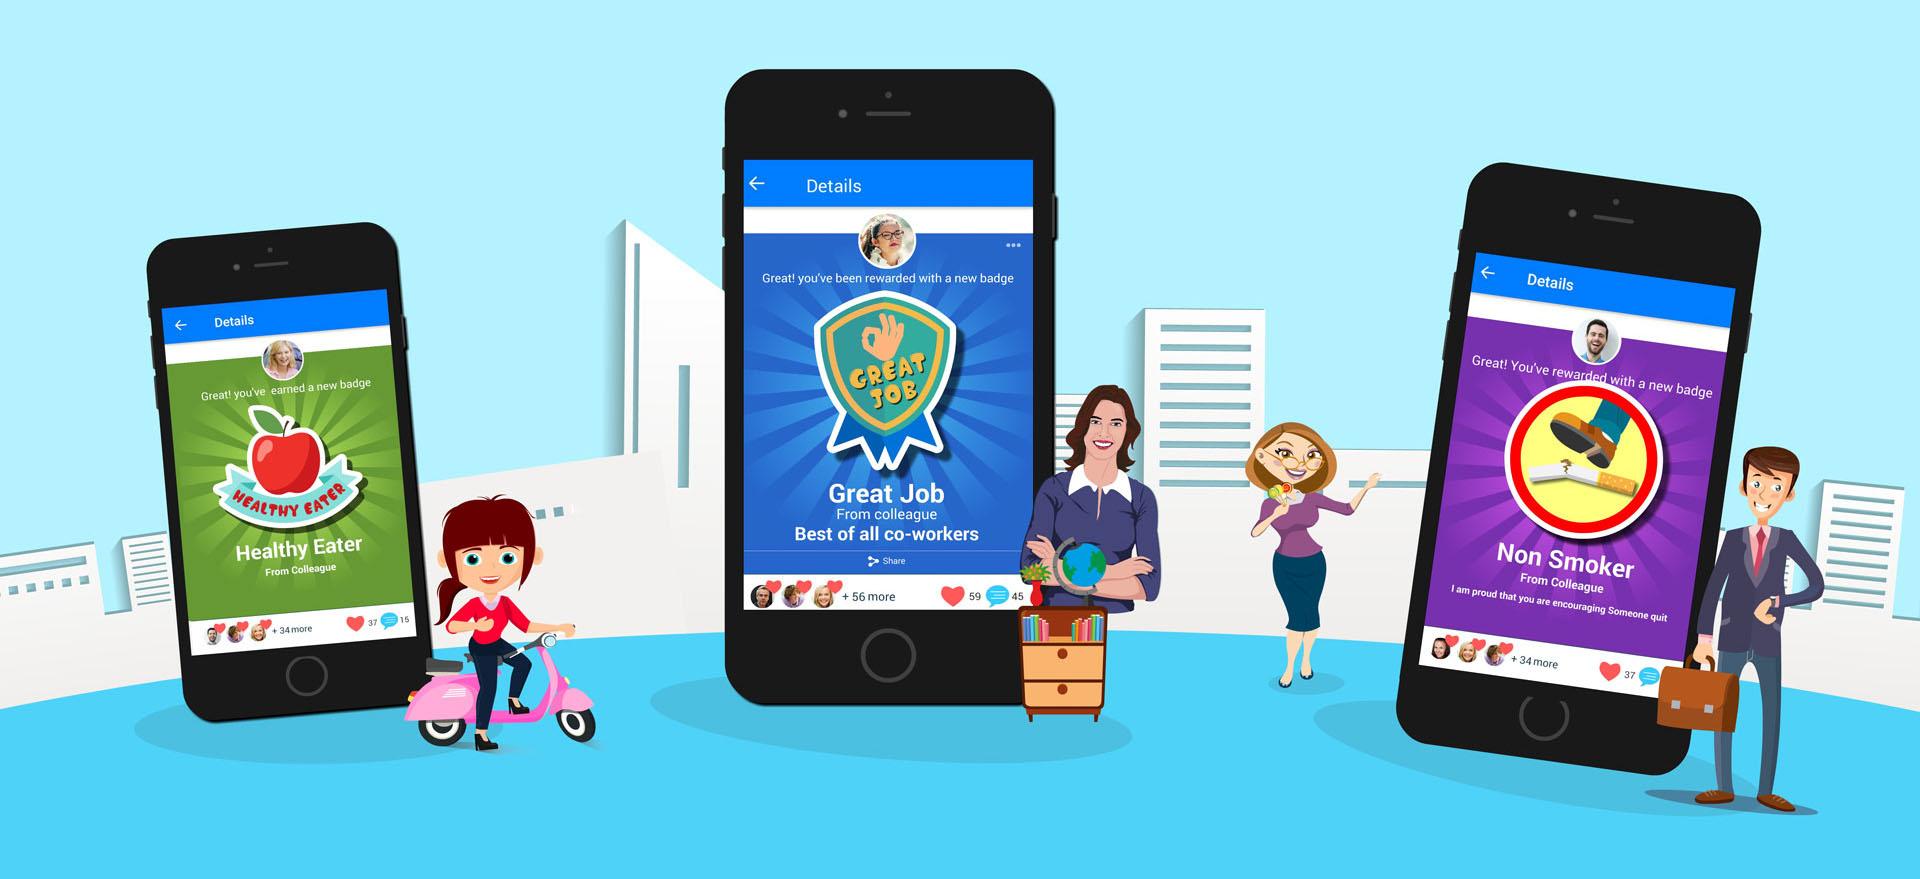 CircleCare-corporate-wellness-program-healthy-workplace-app